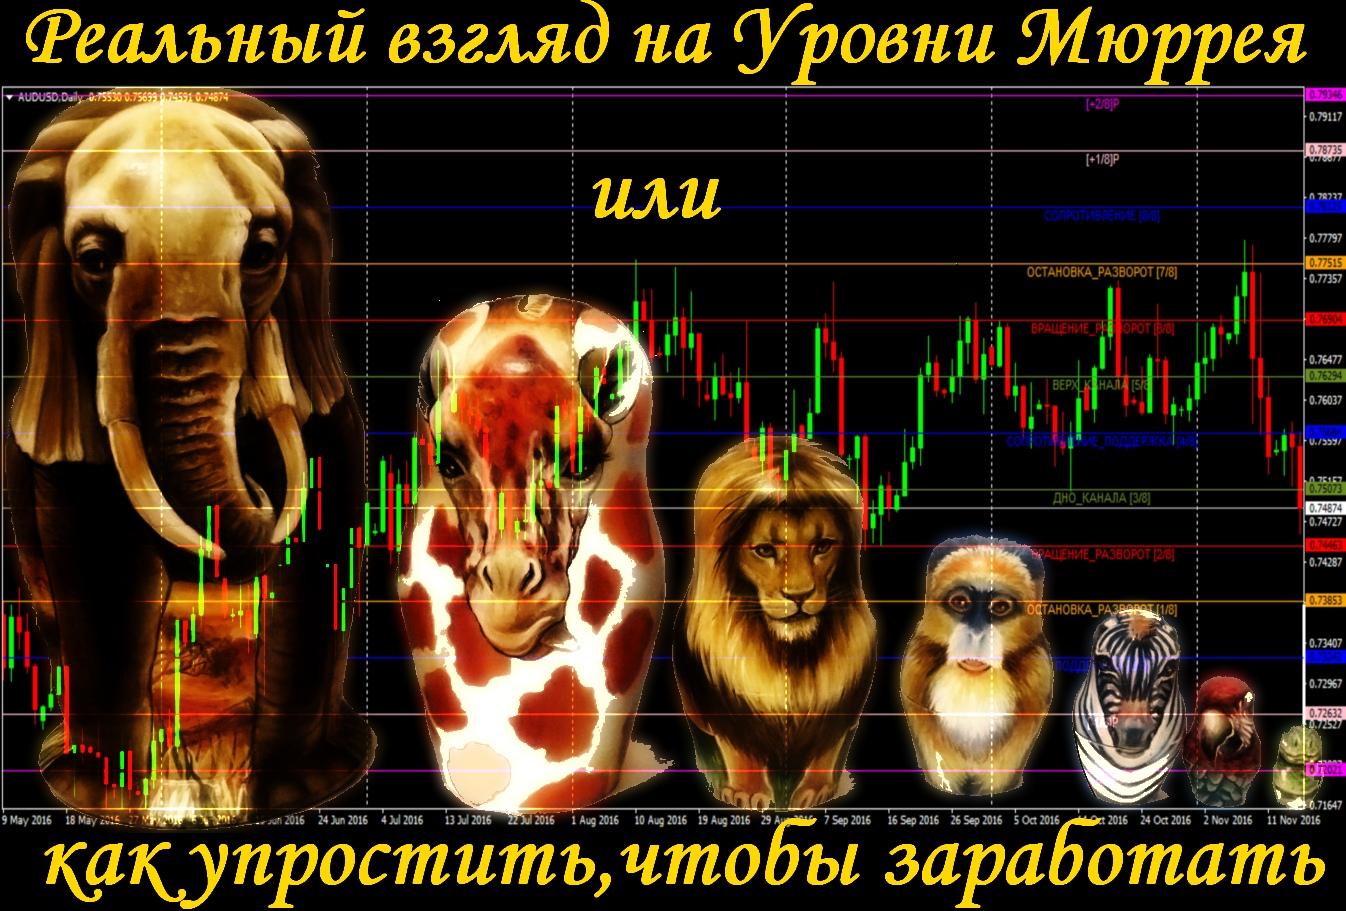 психология рынка форекс оберлехтин томас